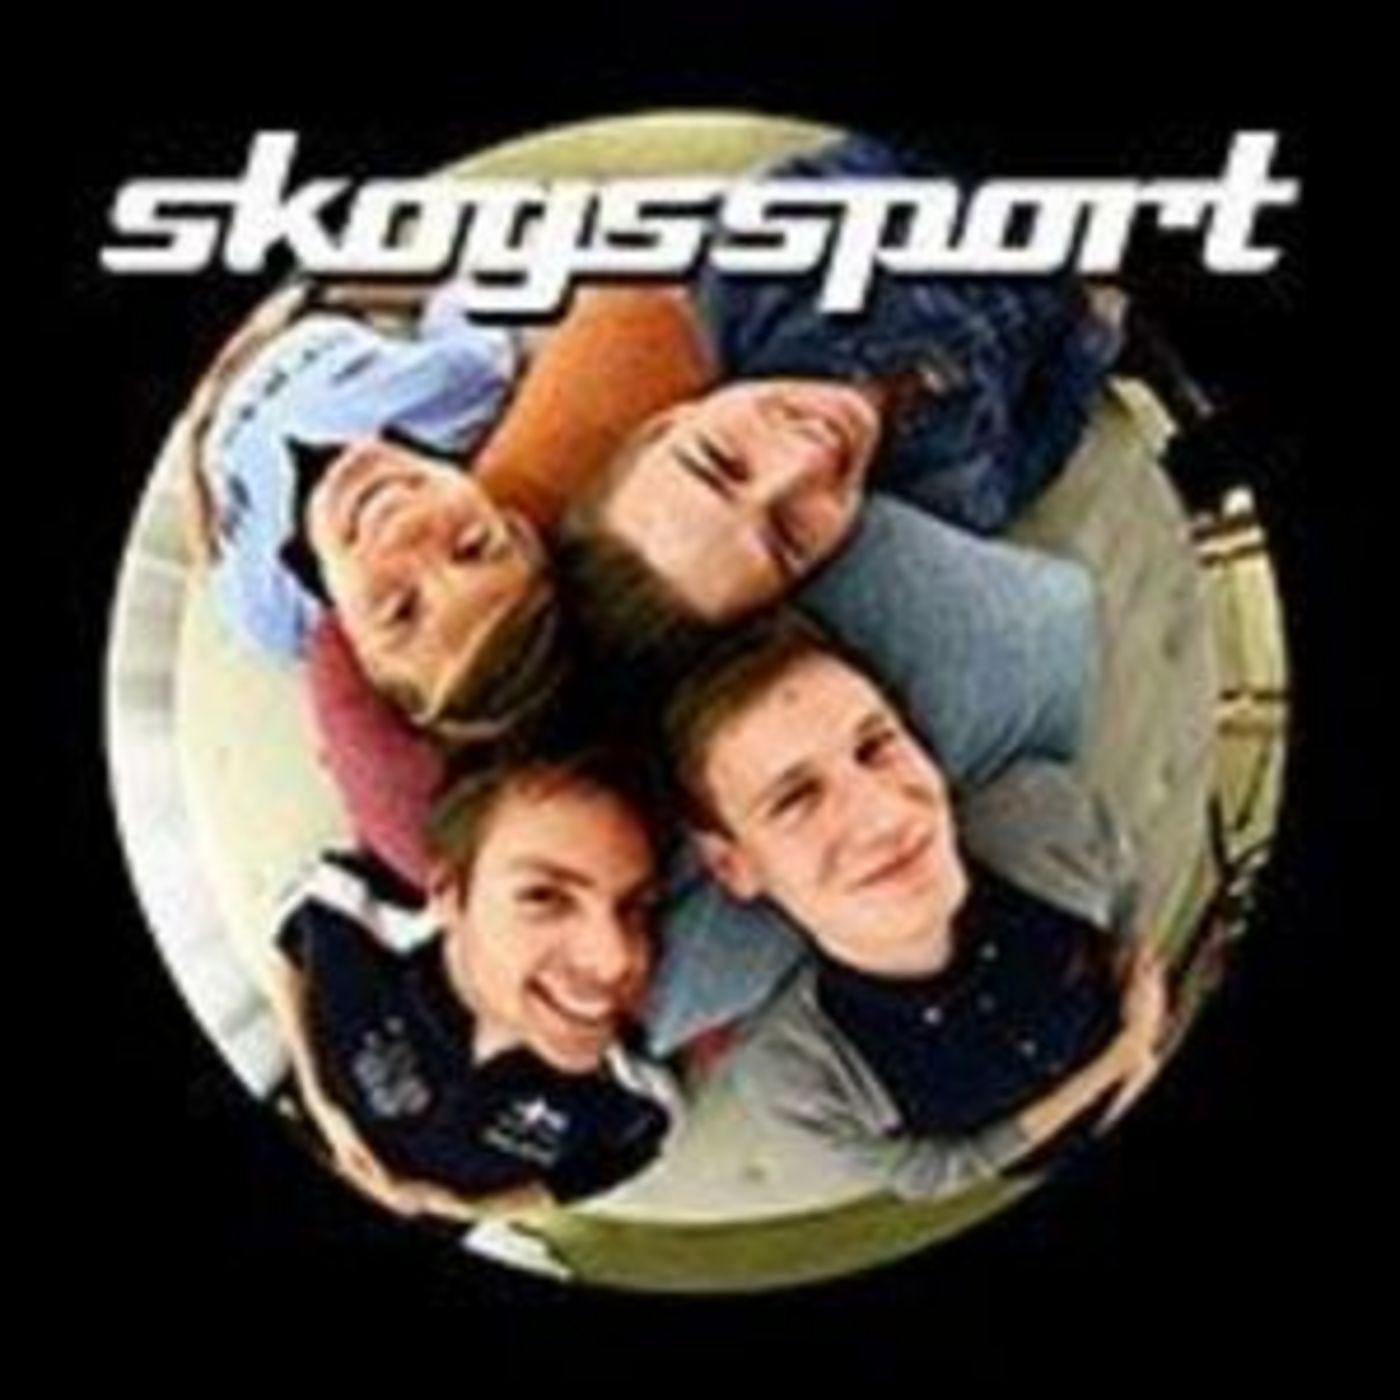 <![CDATA[Skogssport podcast]]>